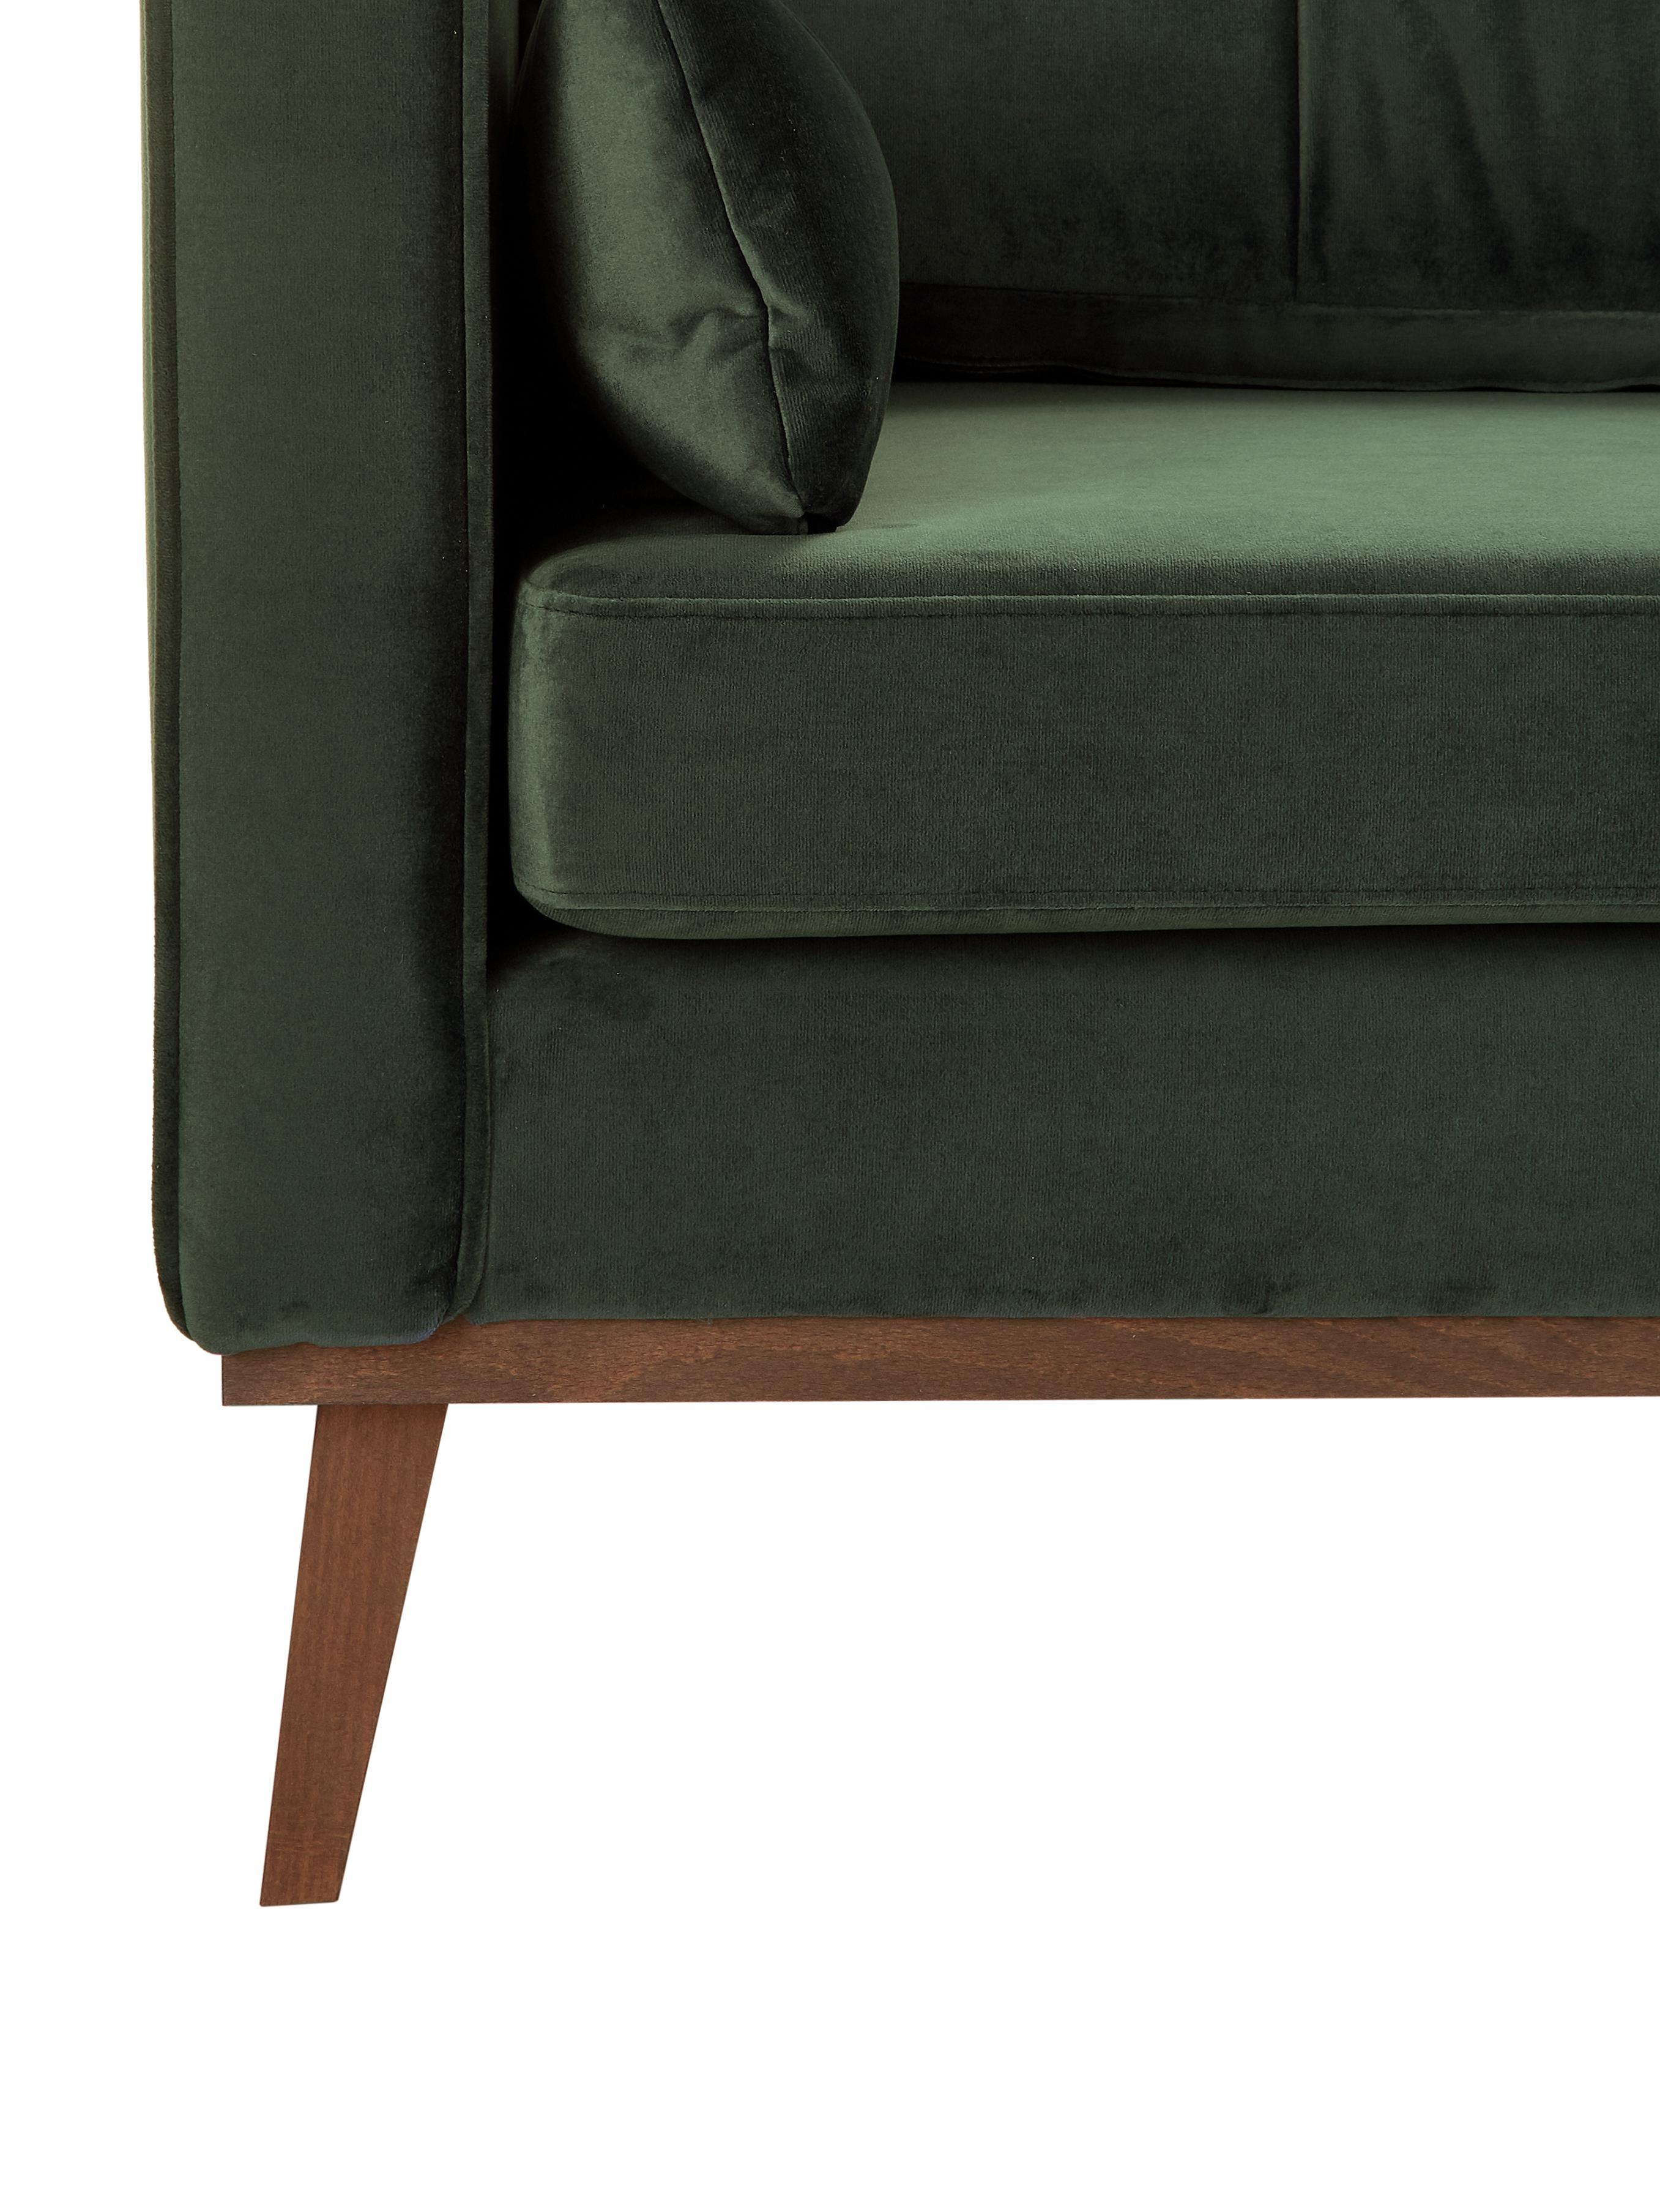 Samt-Sofa Alva (3-Sitzer), Bezug: Samt (Hochwertiger Polyes, Gestell: Massives Kiefernholz, Füße: Massives Buchenholz, gebe, Samt Olive, B 215 x T 92 cm